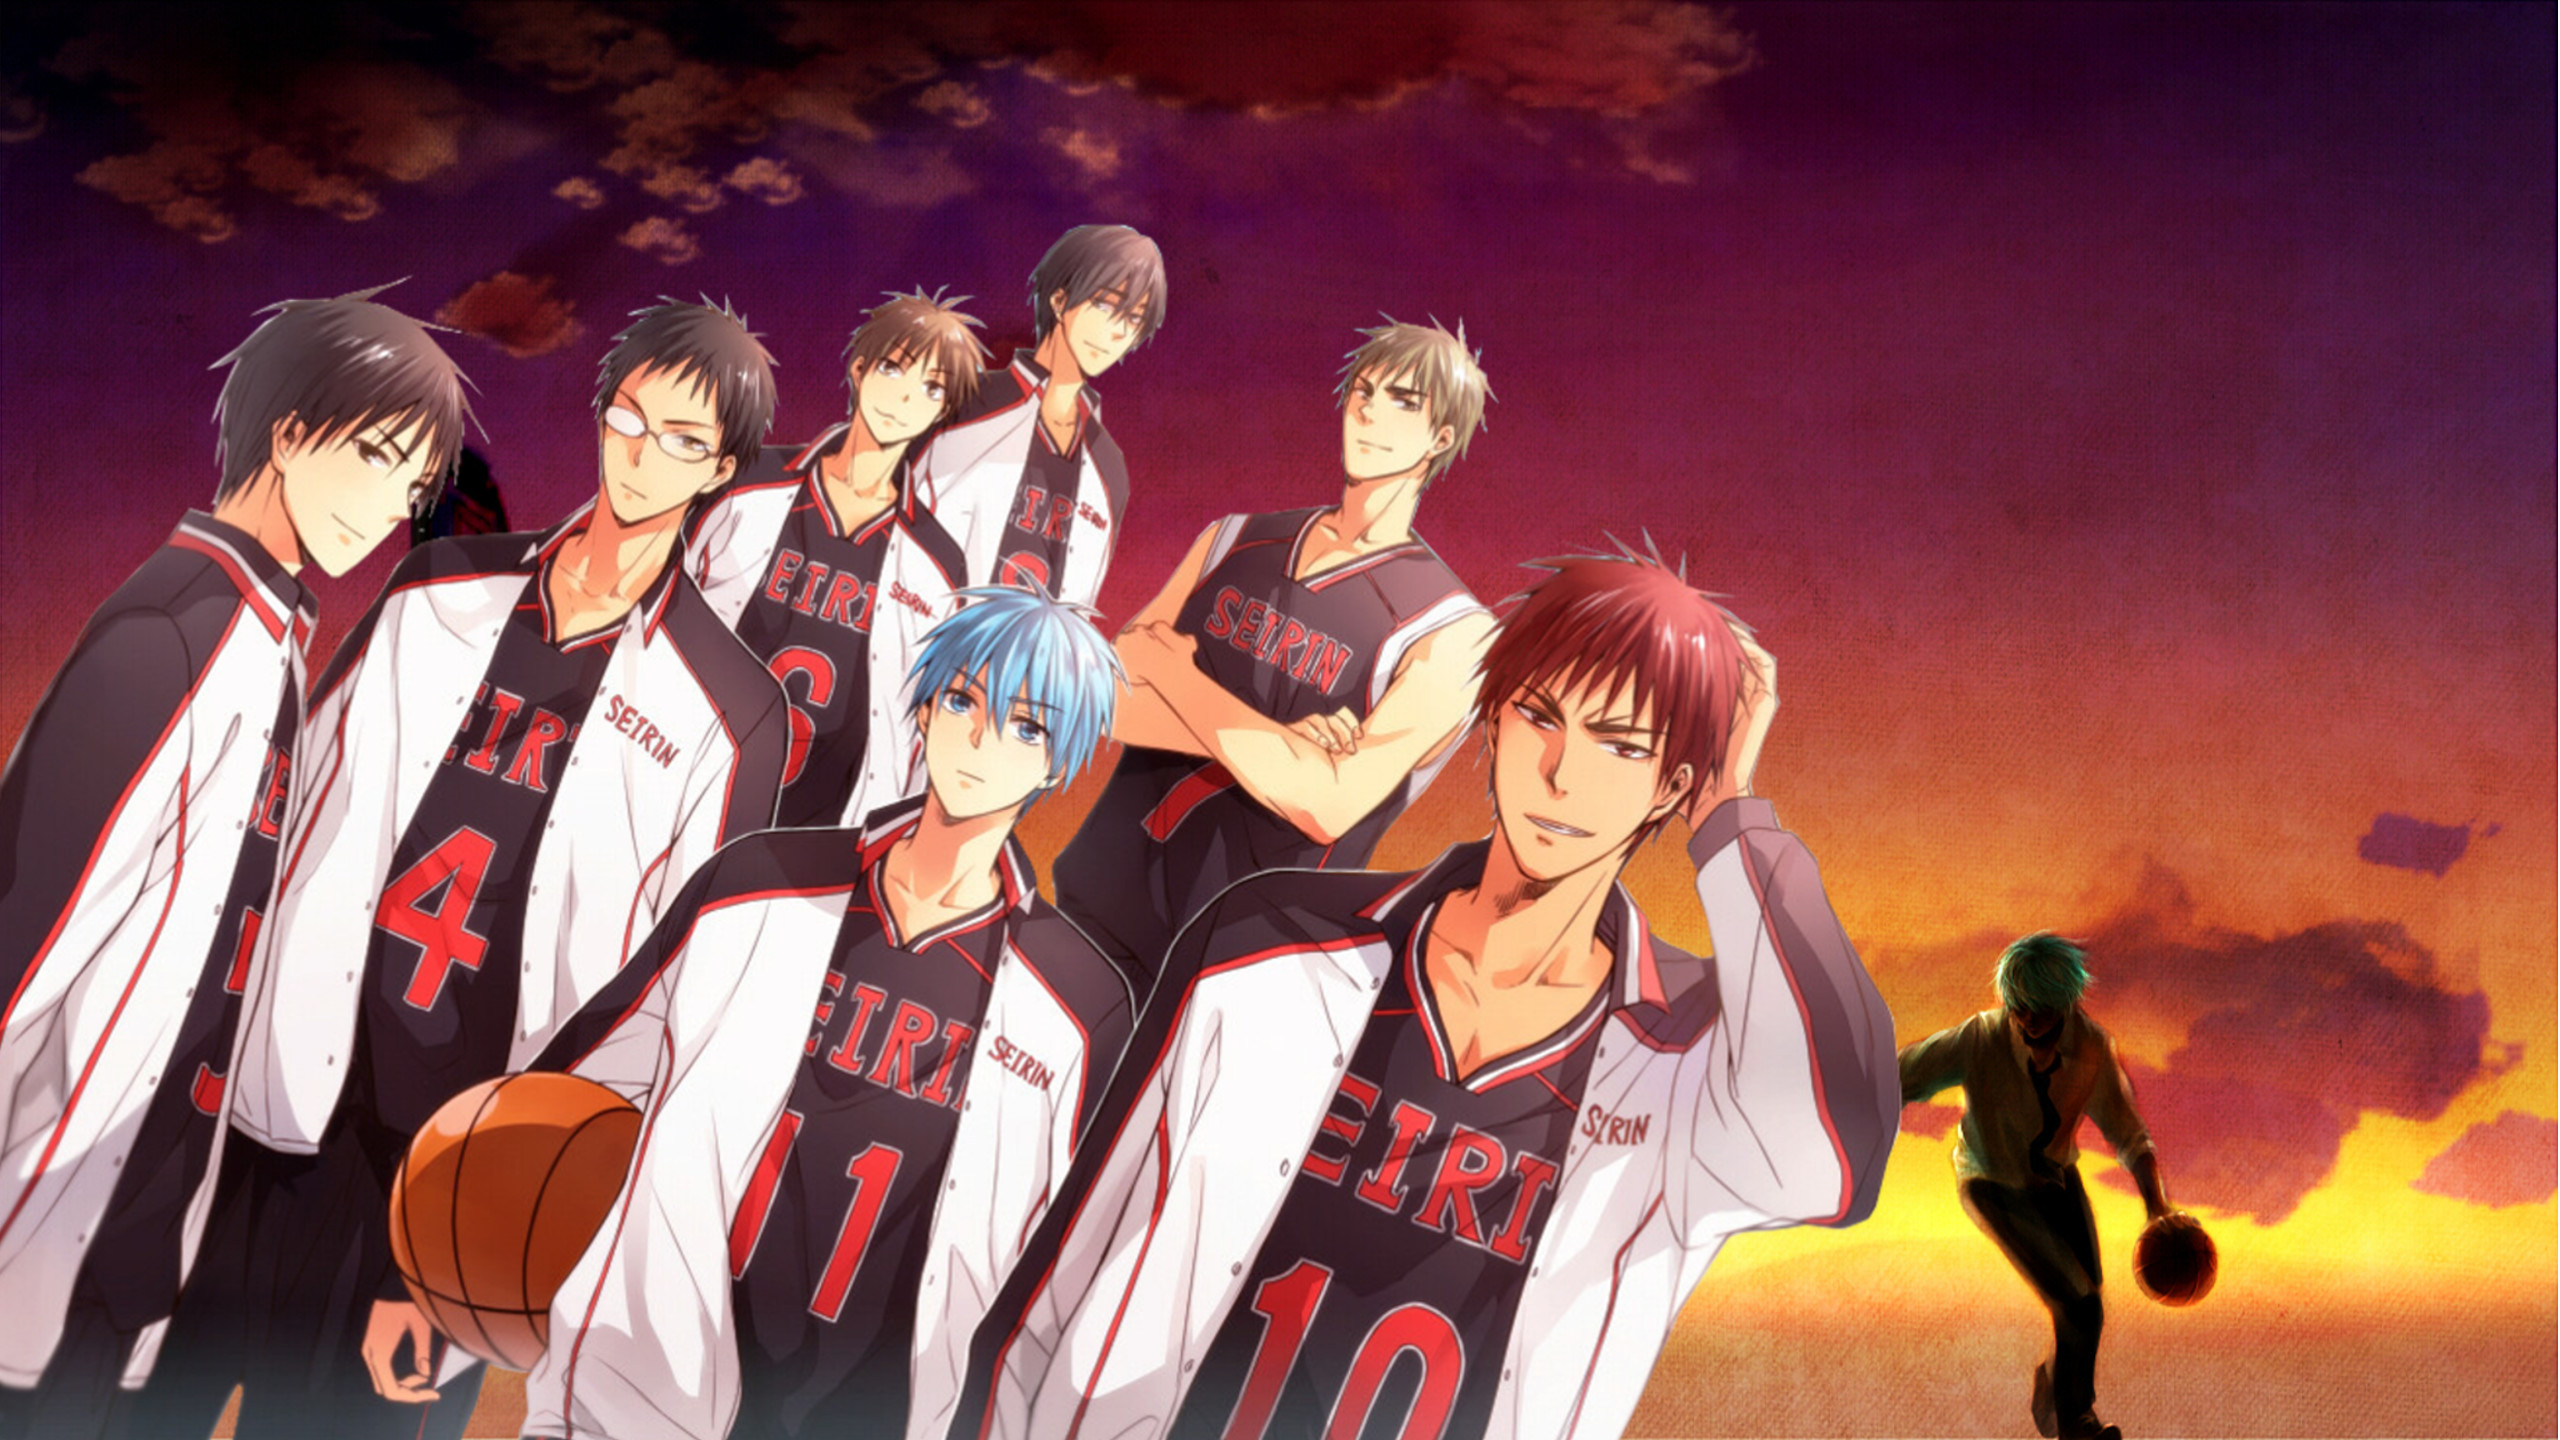 Res: 2560x1440, Kuroko's Basketball Wallpapers 25 - 2560 X 1440